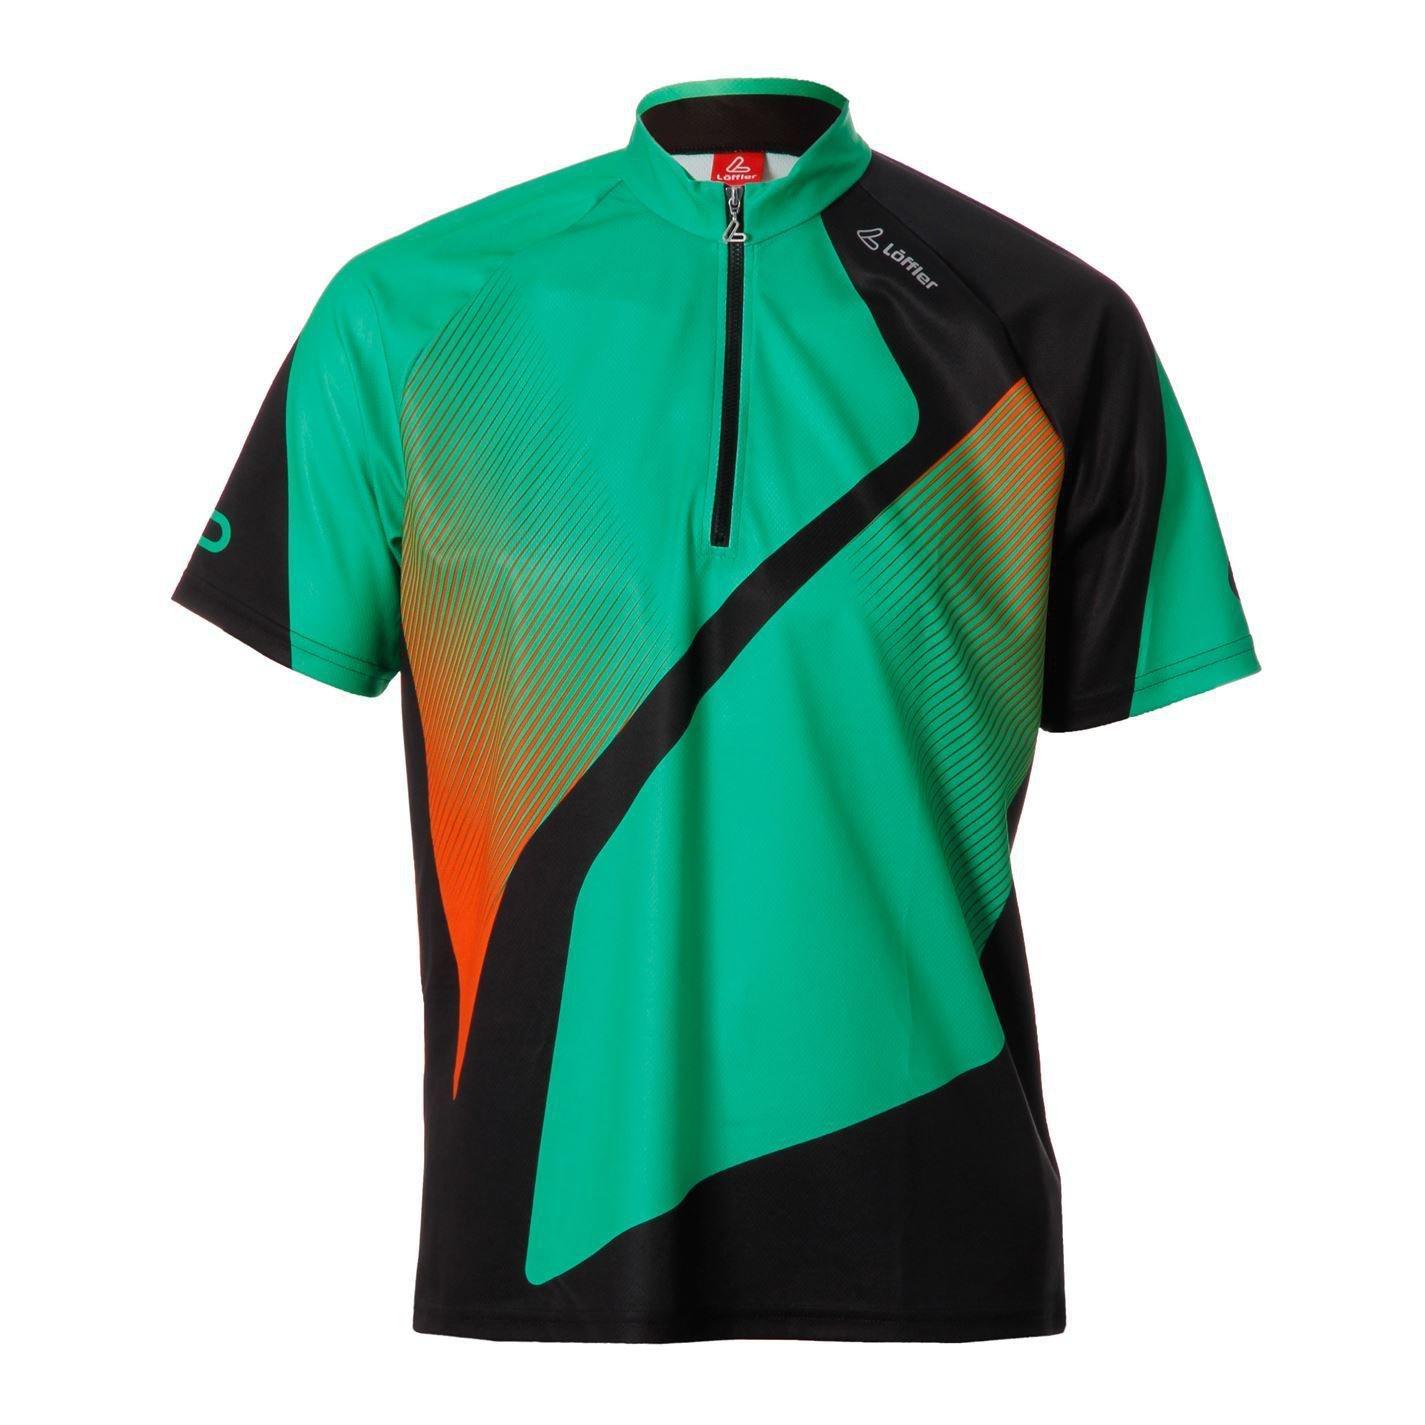 Löffler Mens TriActiveHZ Jersey Short Sleeve Cycle Cycling Sports Shirt Top